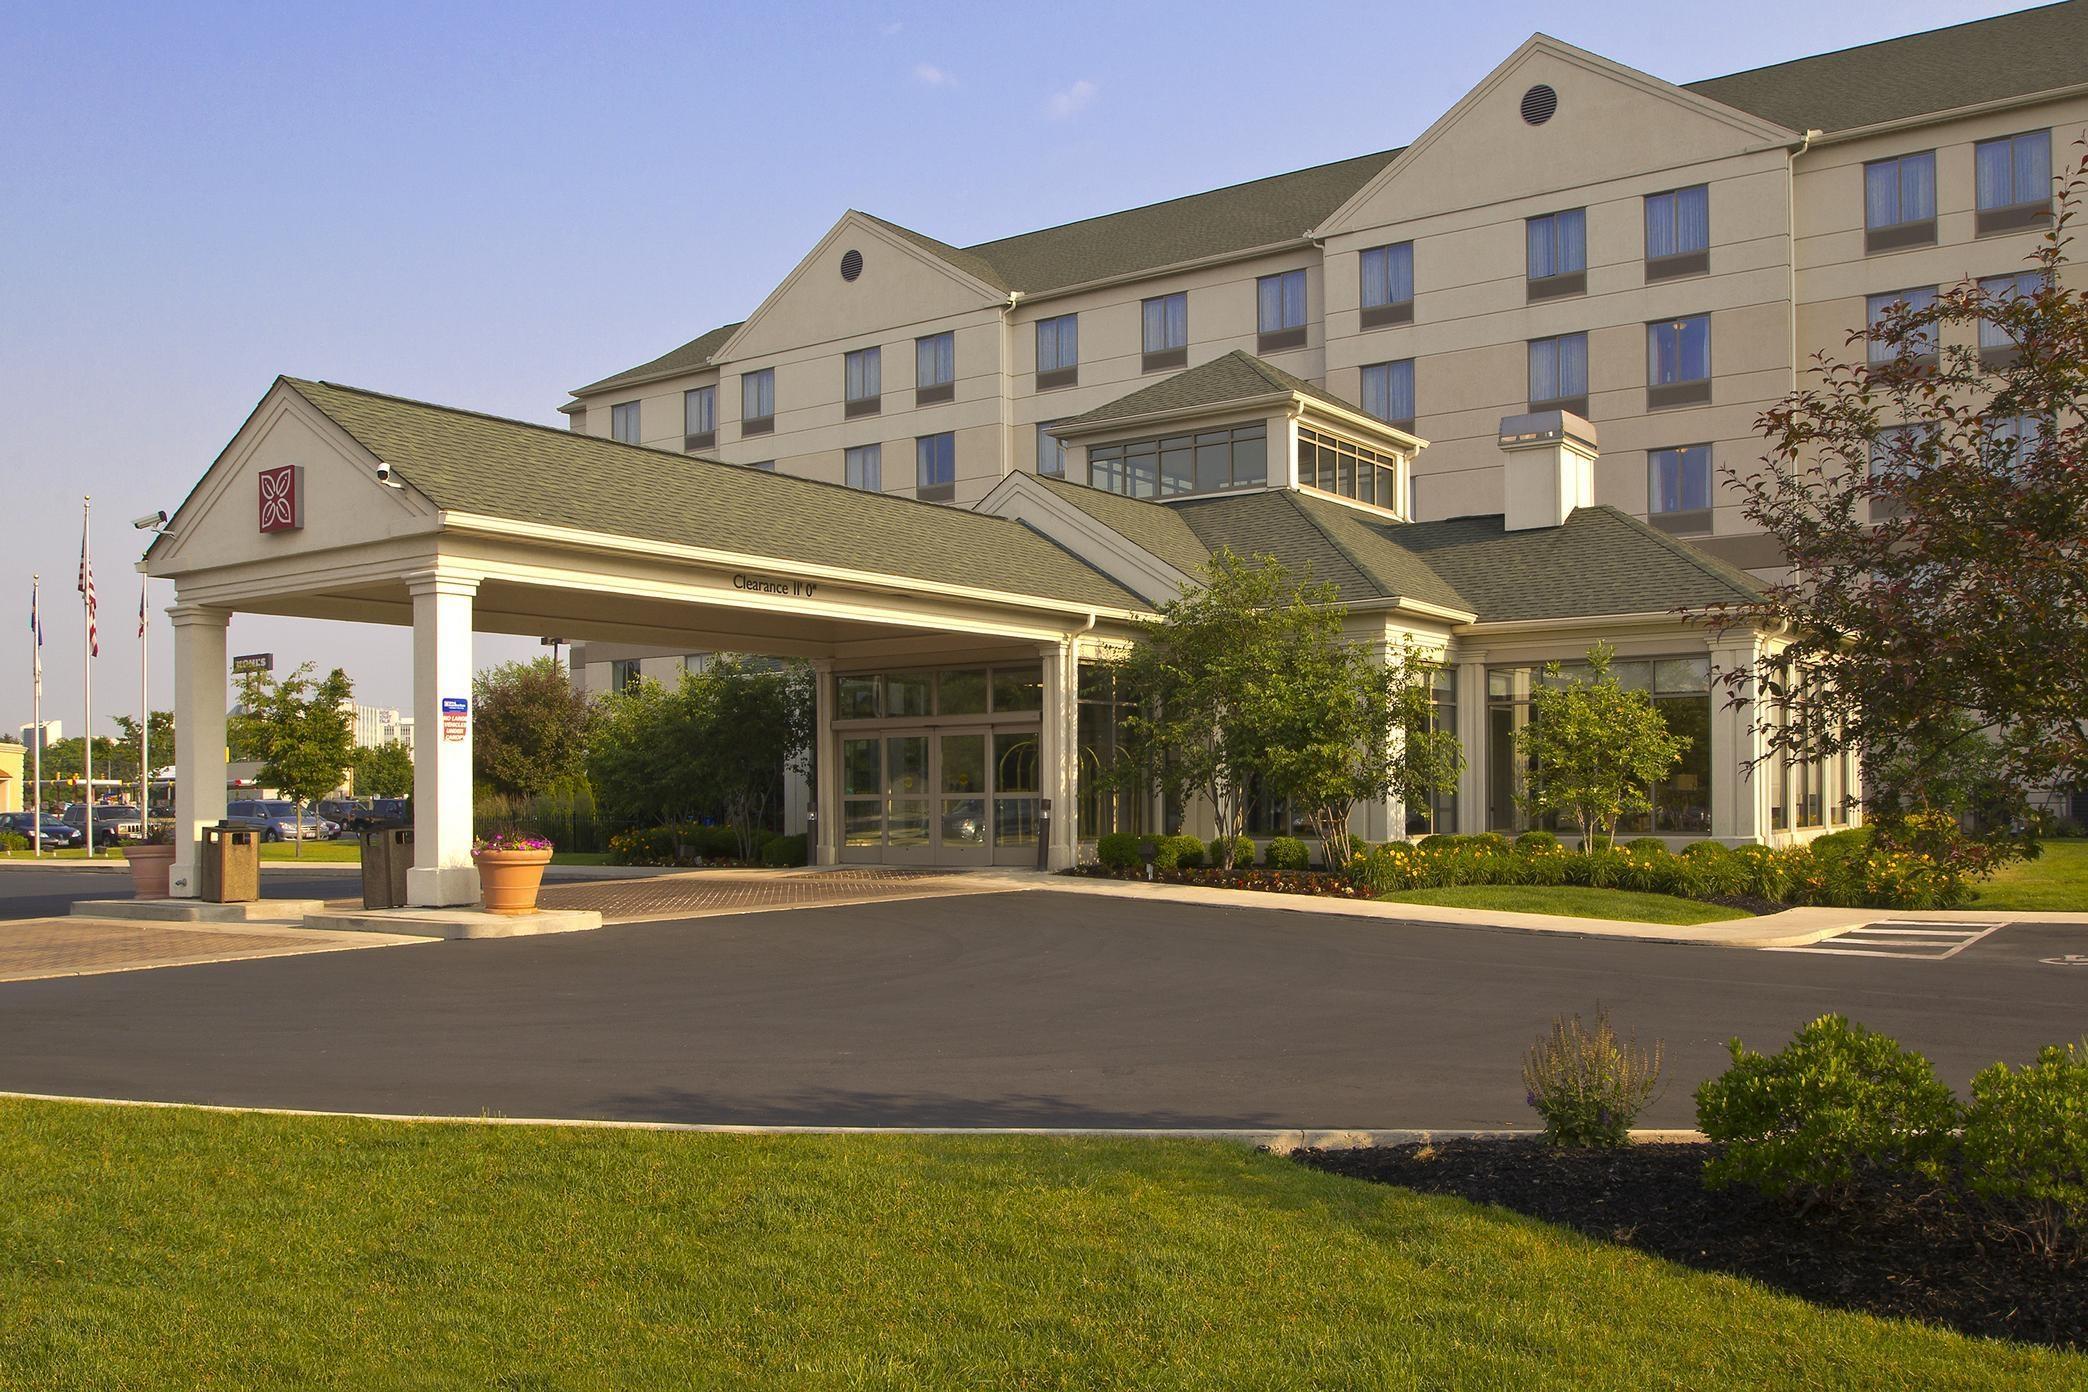 Hilton Garden Inn Columbus-University Area 3232 Olentangy River Road ...